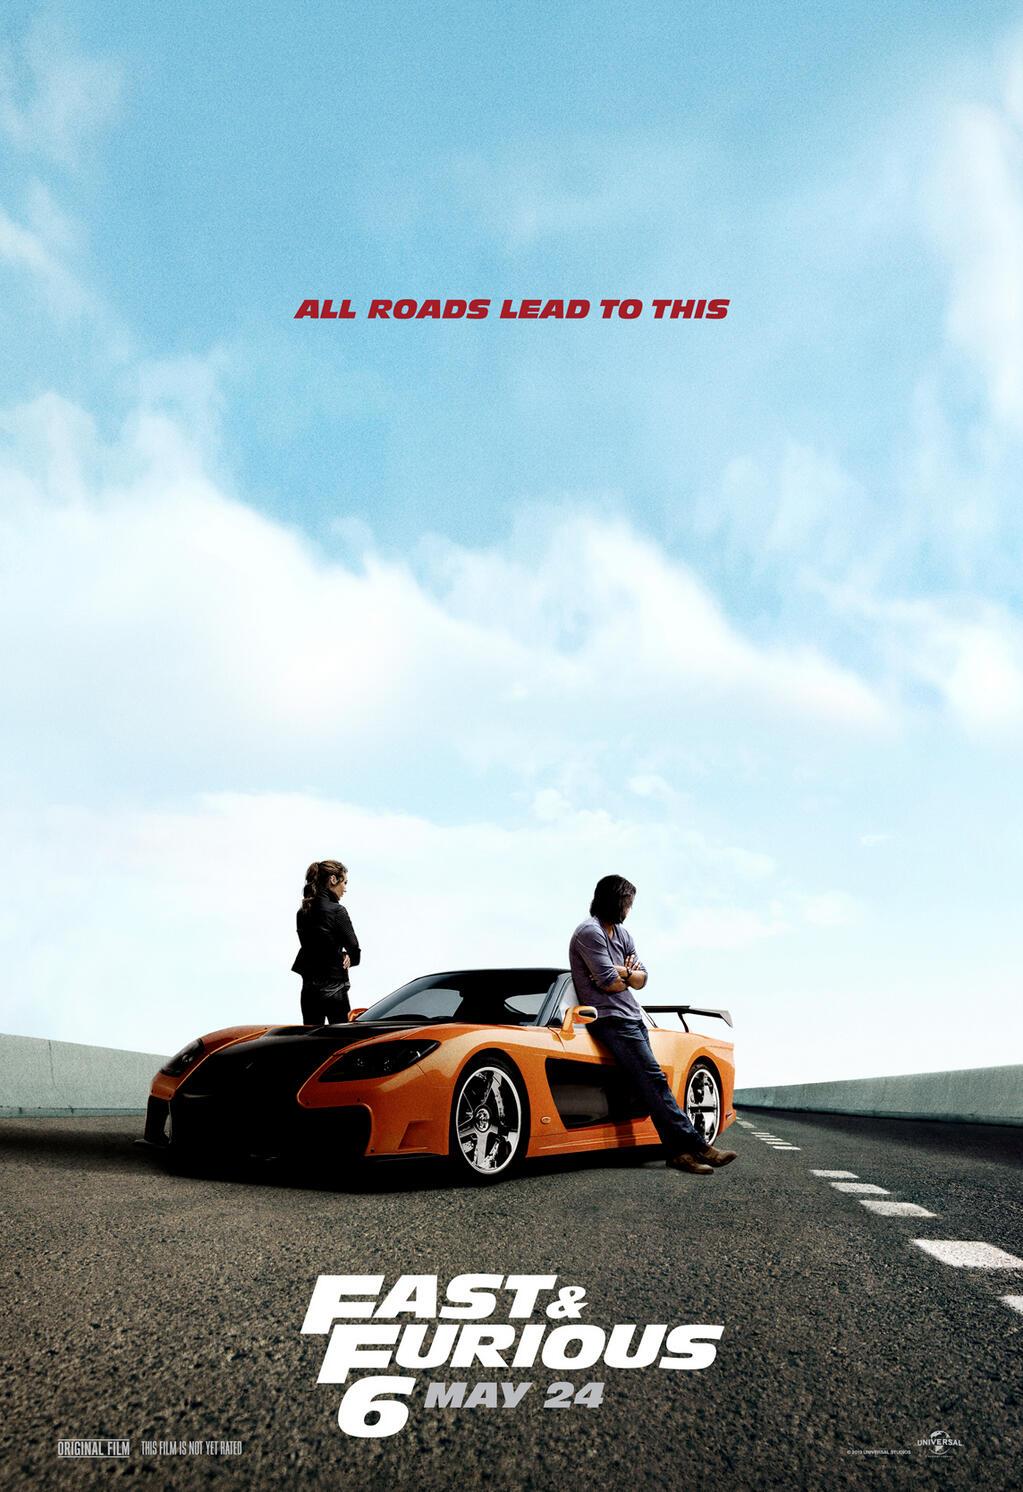 Fast And Furious 6 2013 Poster Gal Gadot Sung Kang Fast